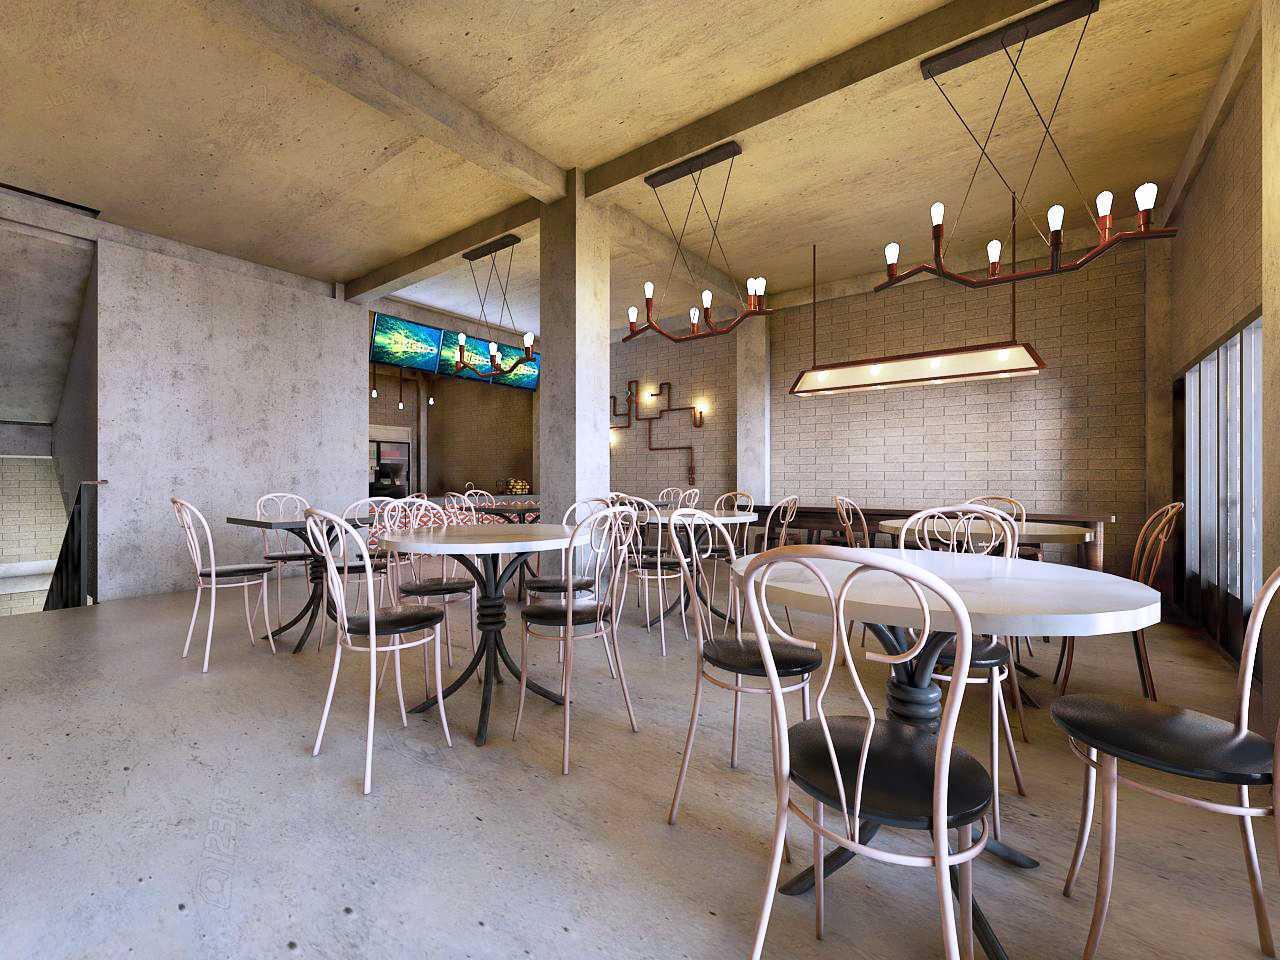 Project Pempek Candy Desain Arsitek Oleh Roemah Cantik Arsitag Palembang